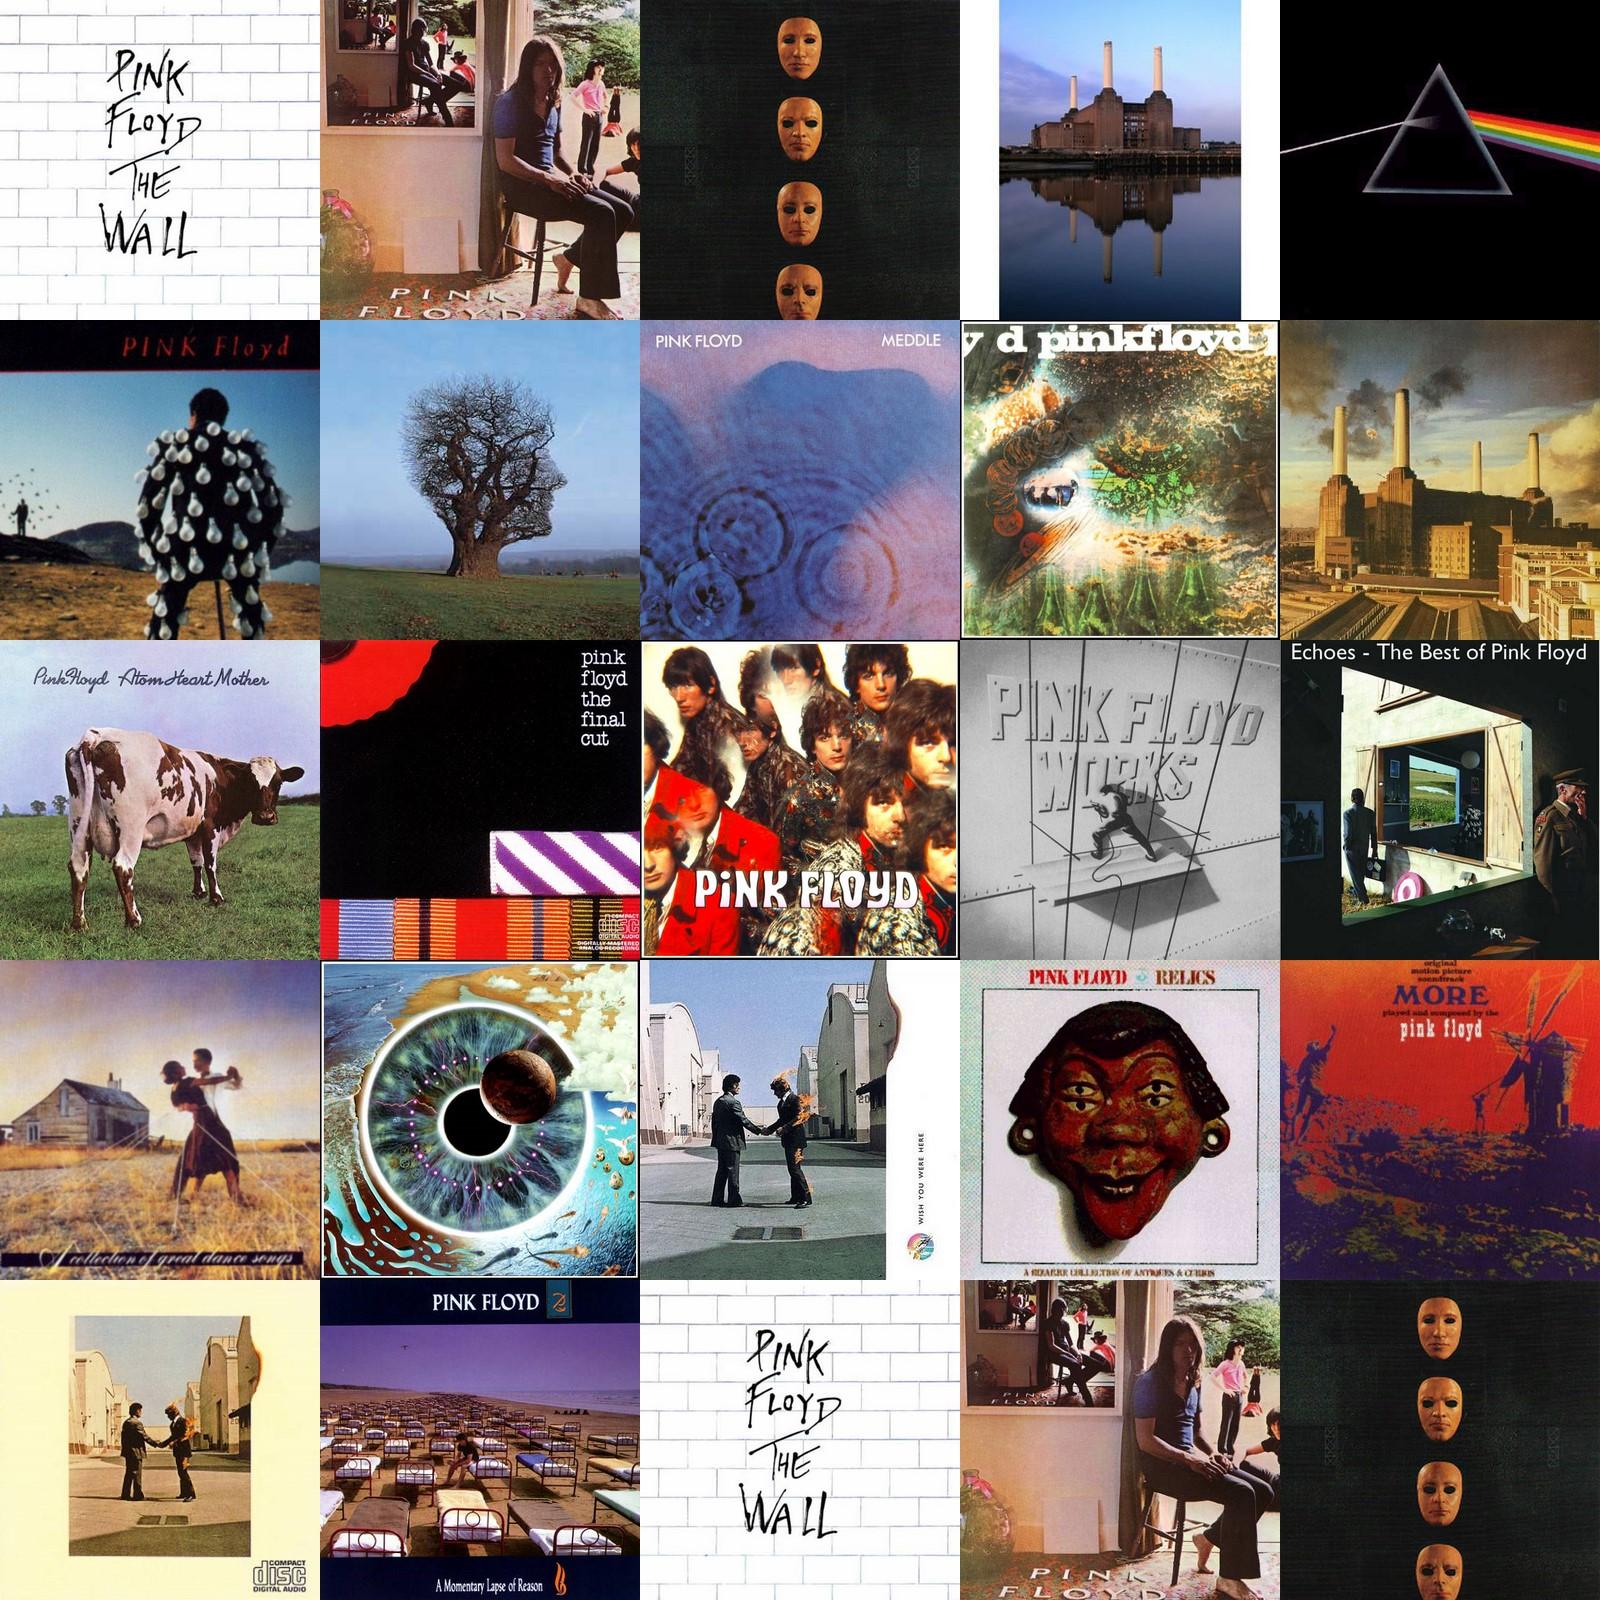 pink-floyd-album-covers.jpeg